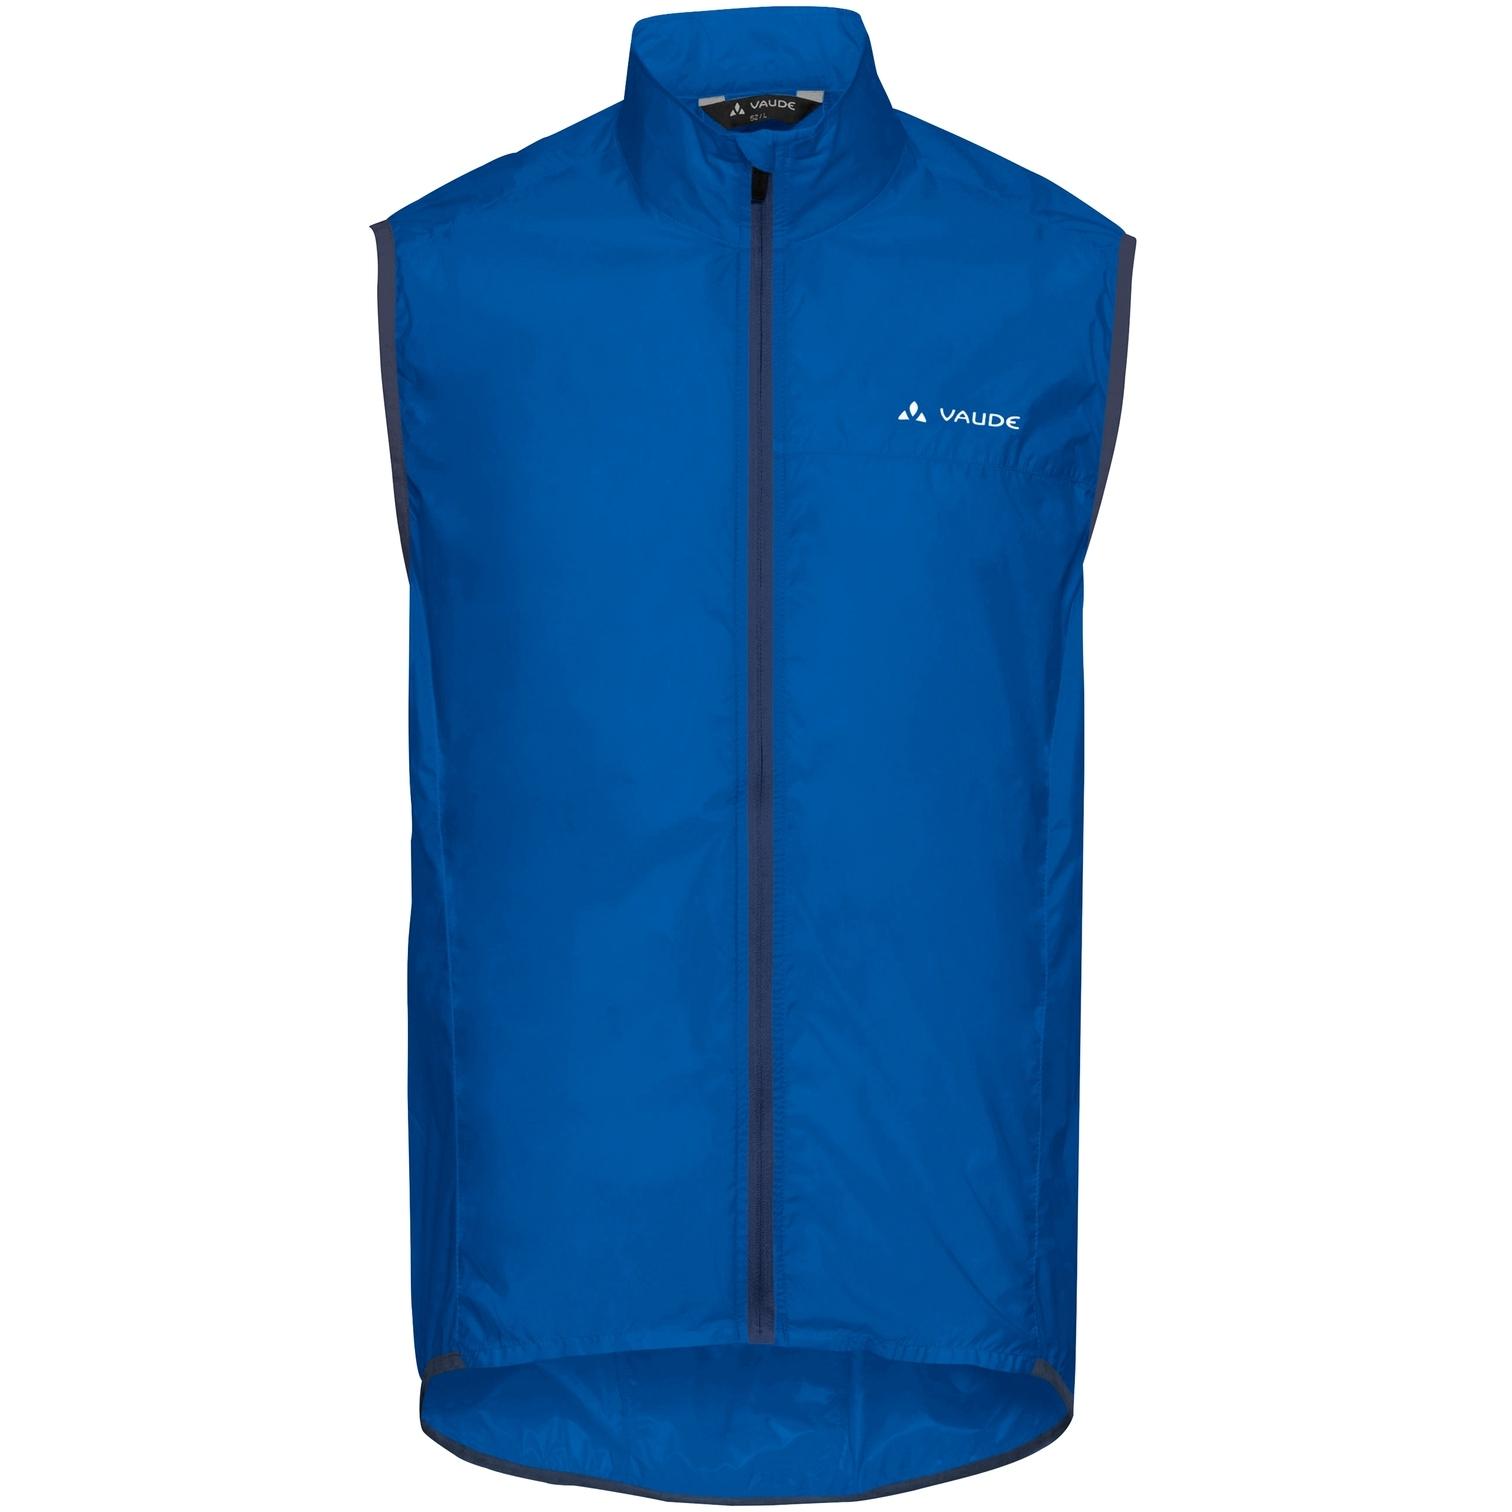 Vaude Men's Air Vest III - signal blue